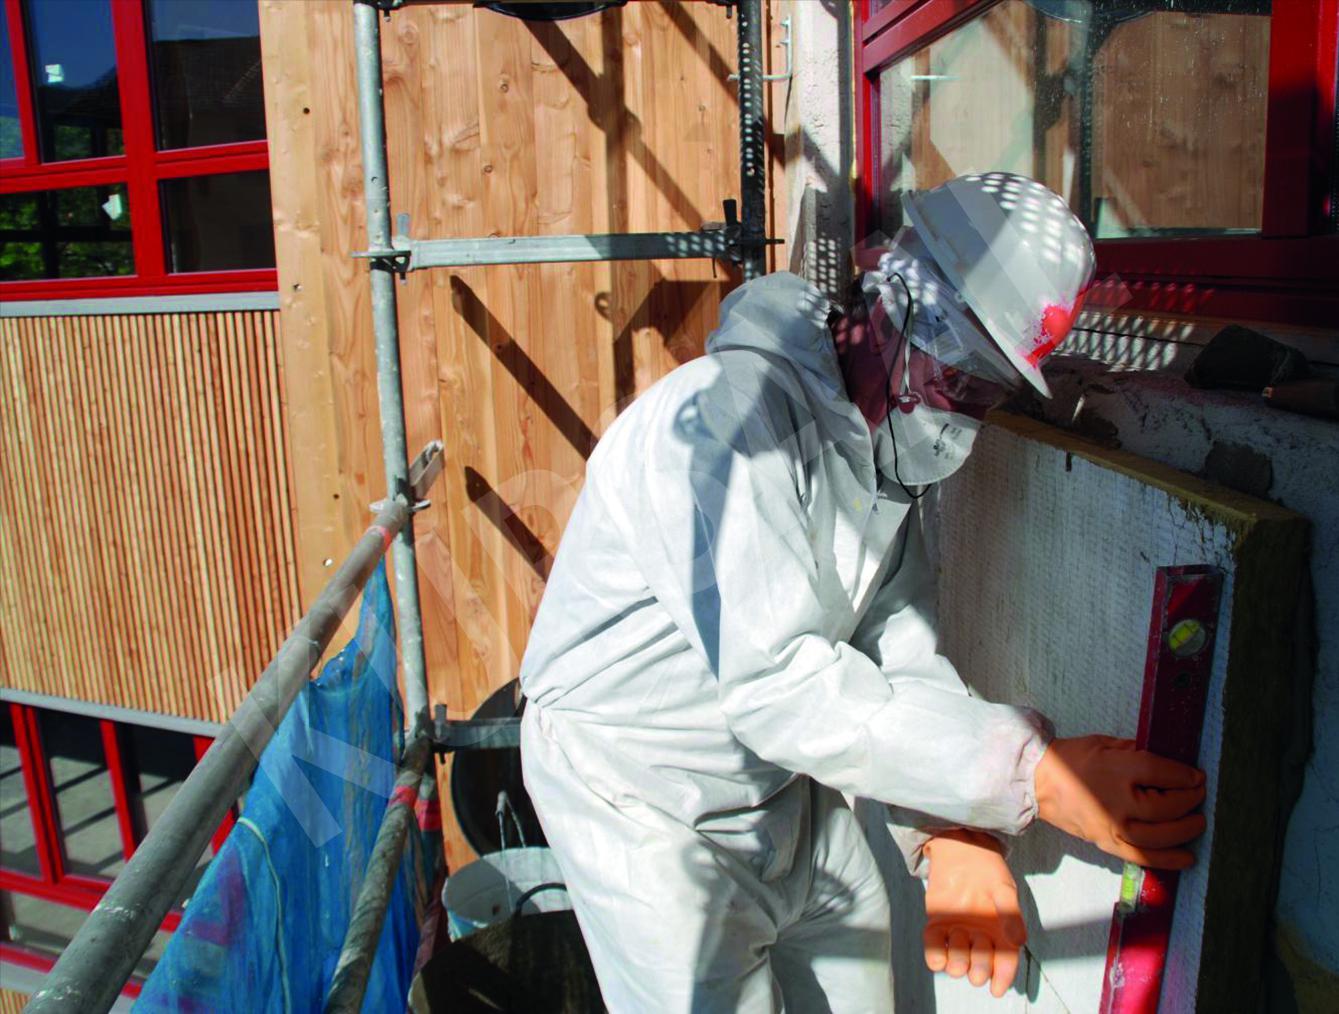 foto 2 - Aislamientos Térmicos y Eficiencia Energética-Ikastola Laskorain-TOLOSA, GIPUZKOA